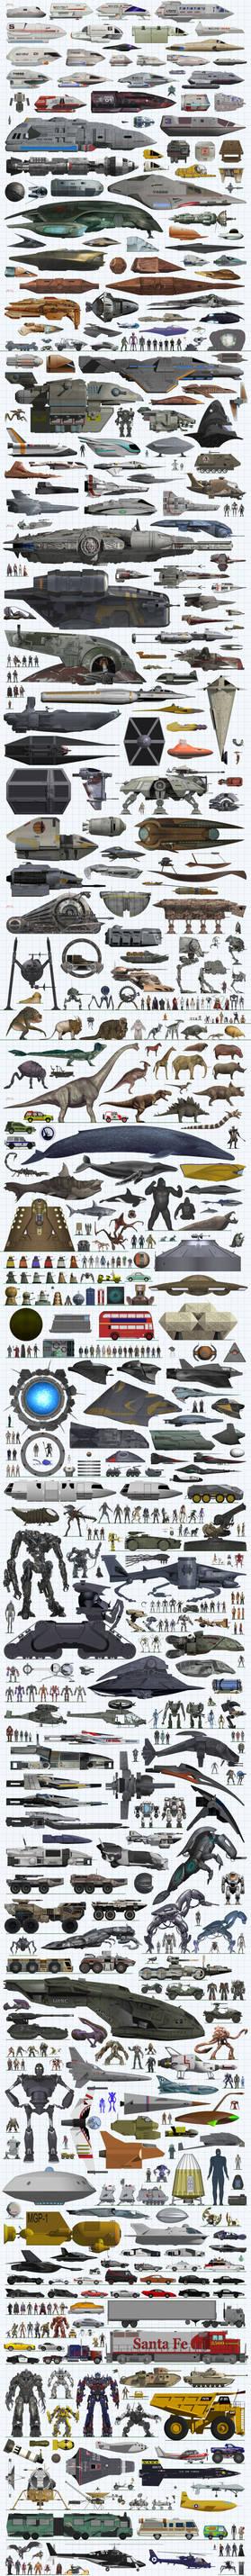 Starship Dimentions (100x)